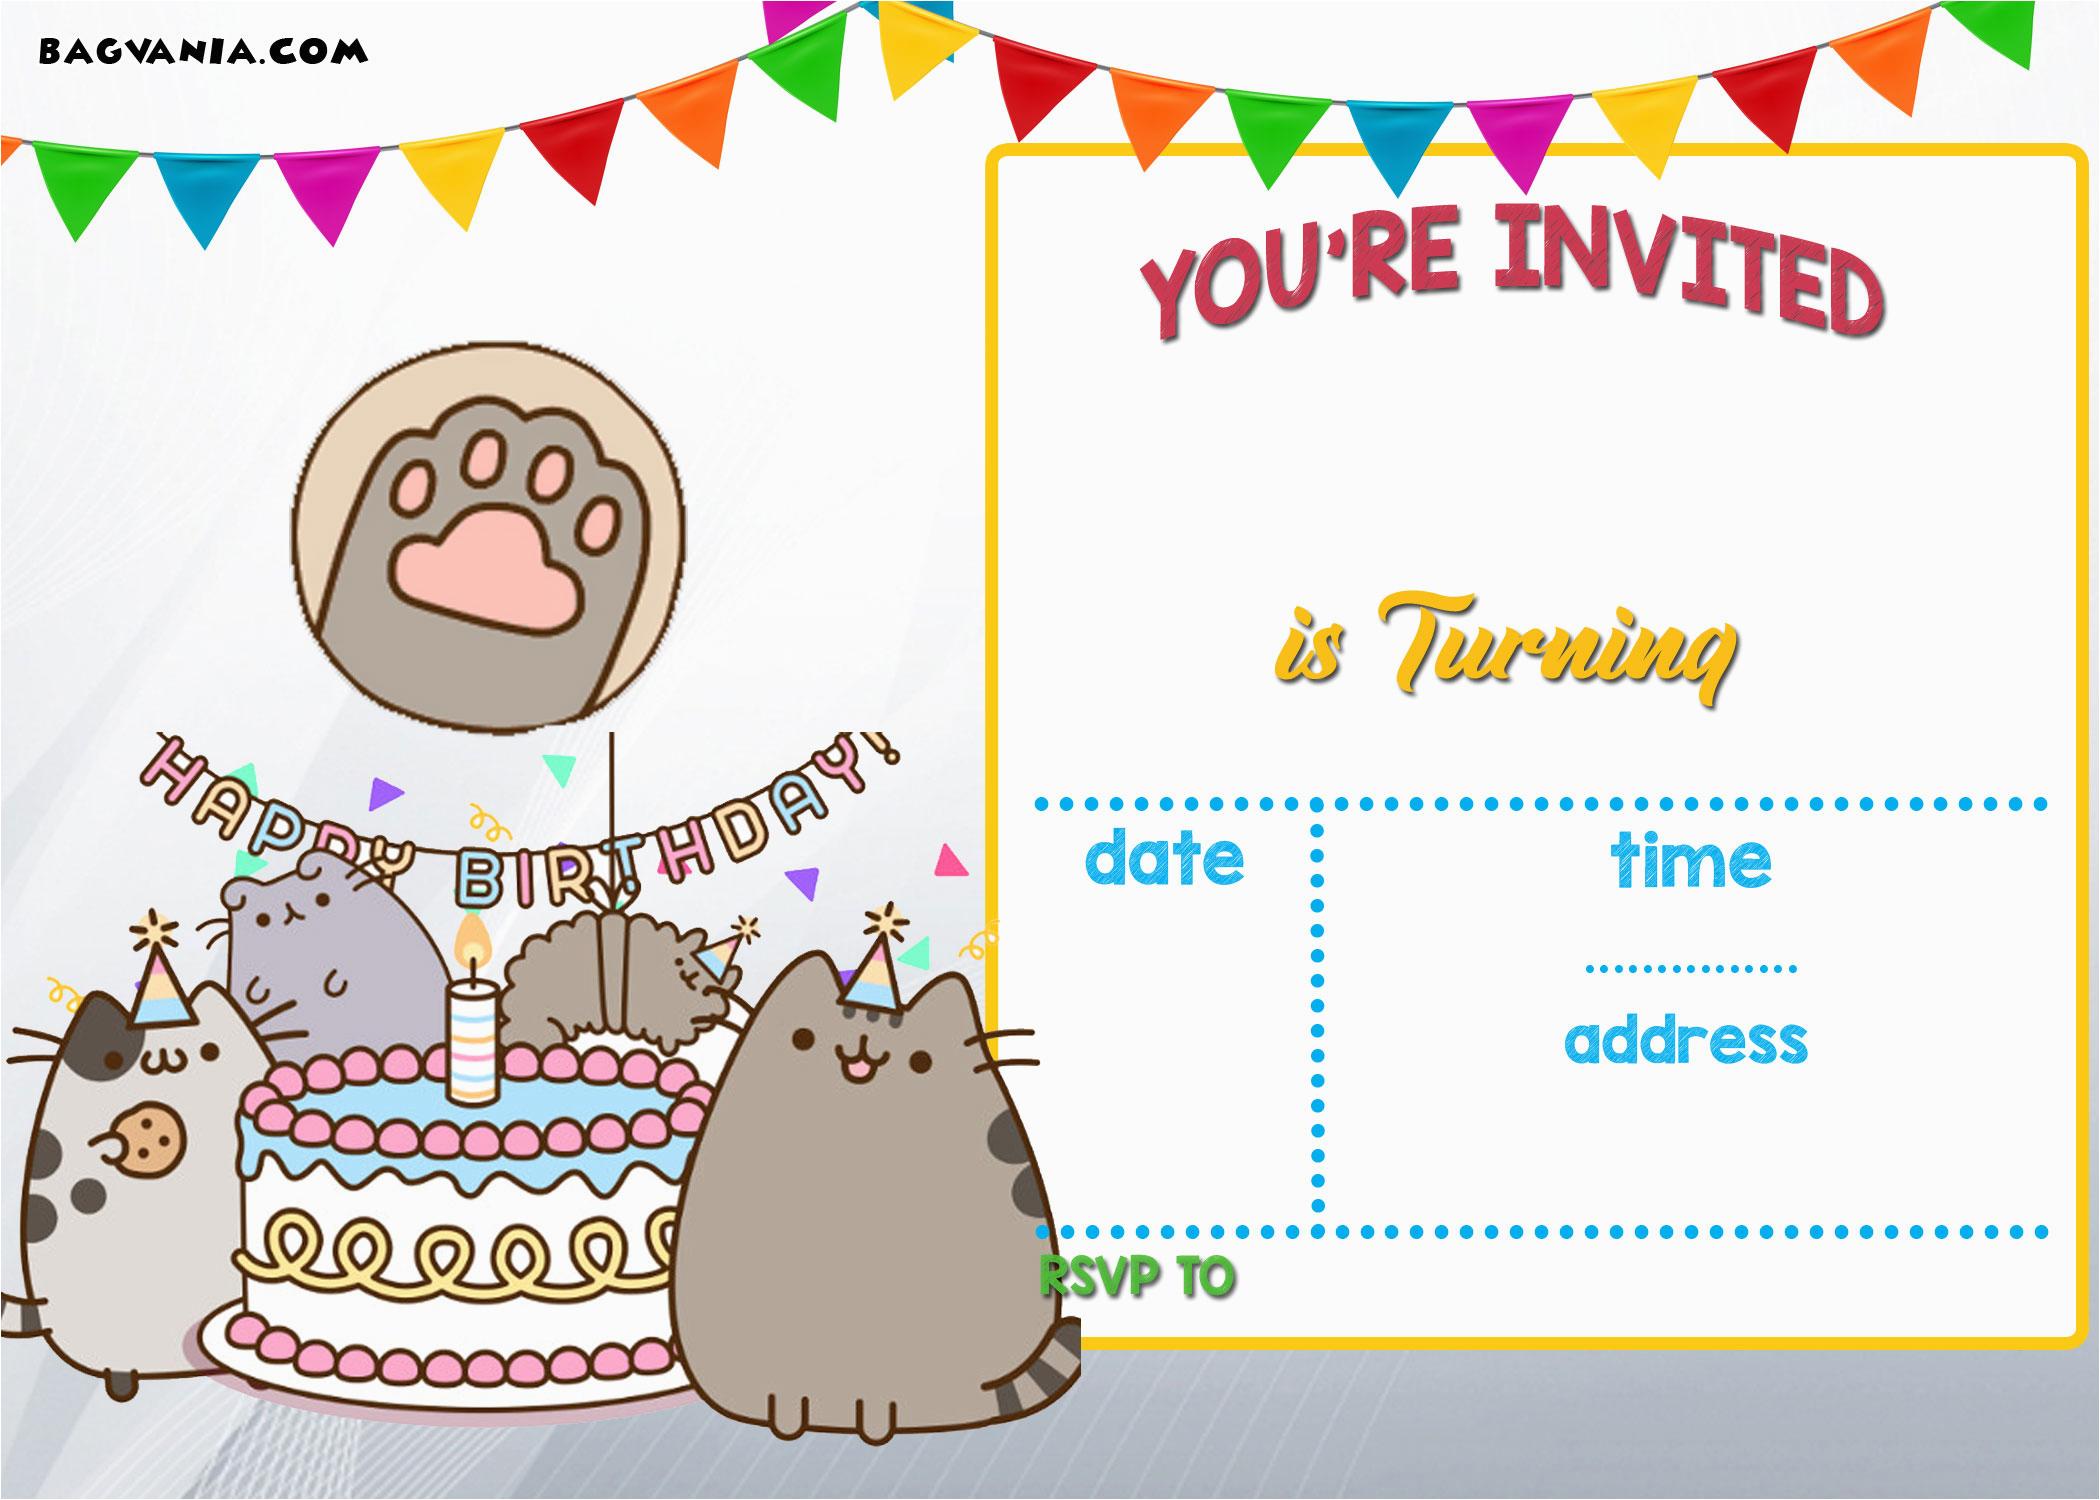 Printable Birthday Card Invitations Free Pusheen Invitation Template